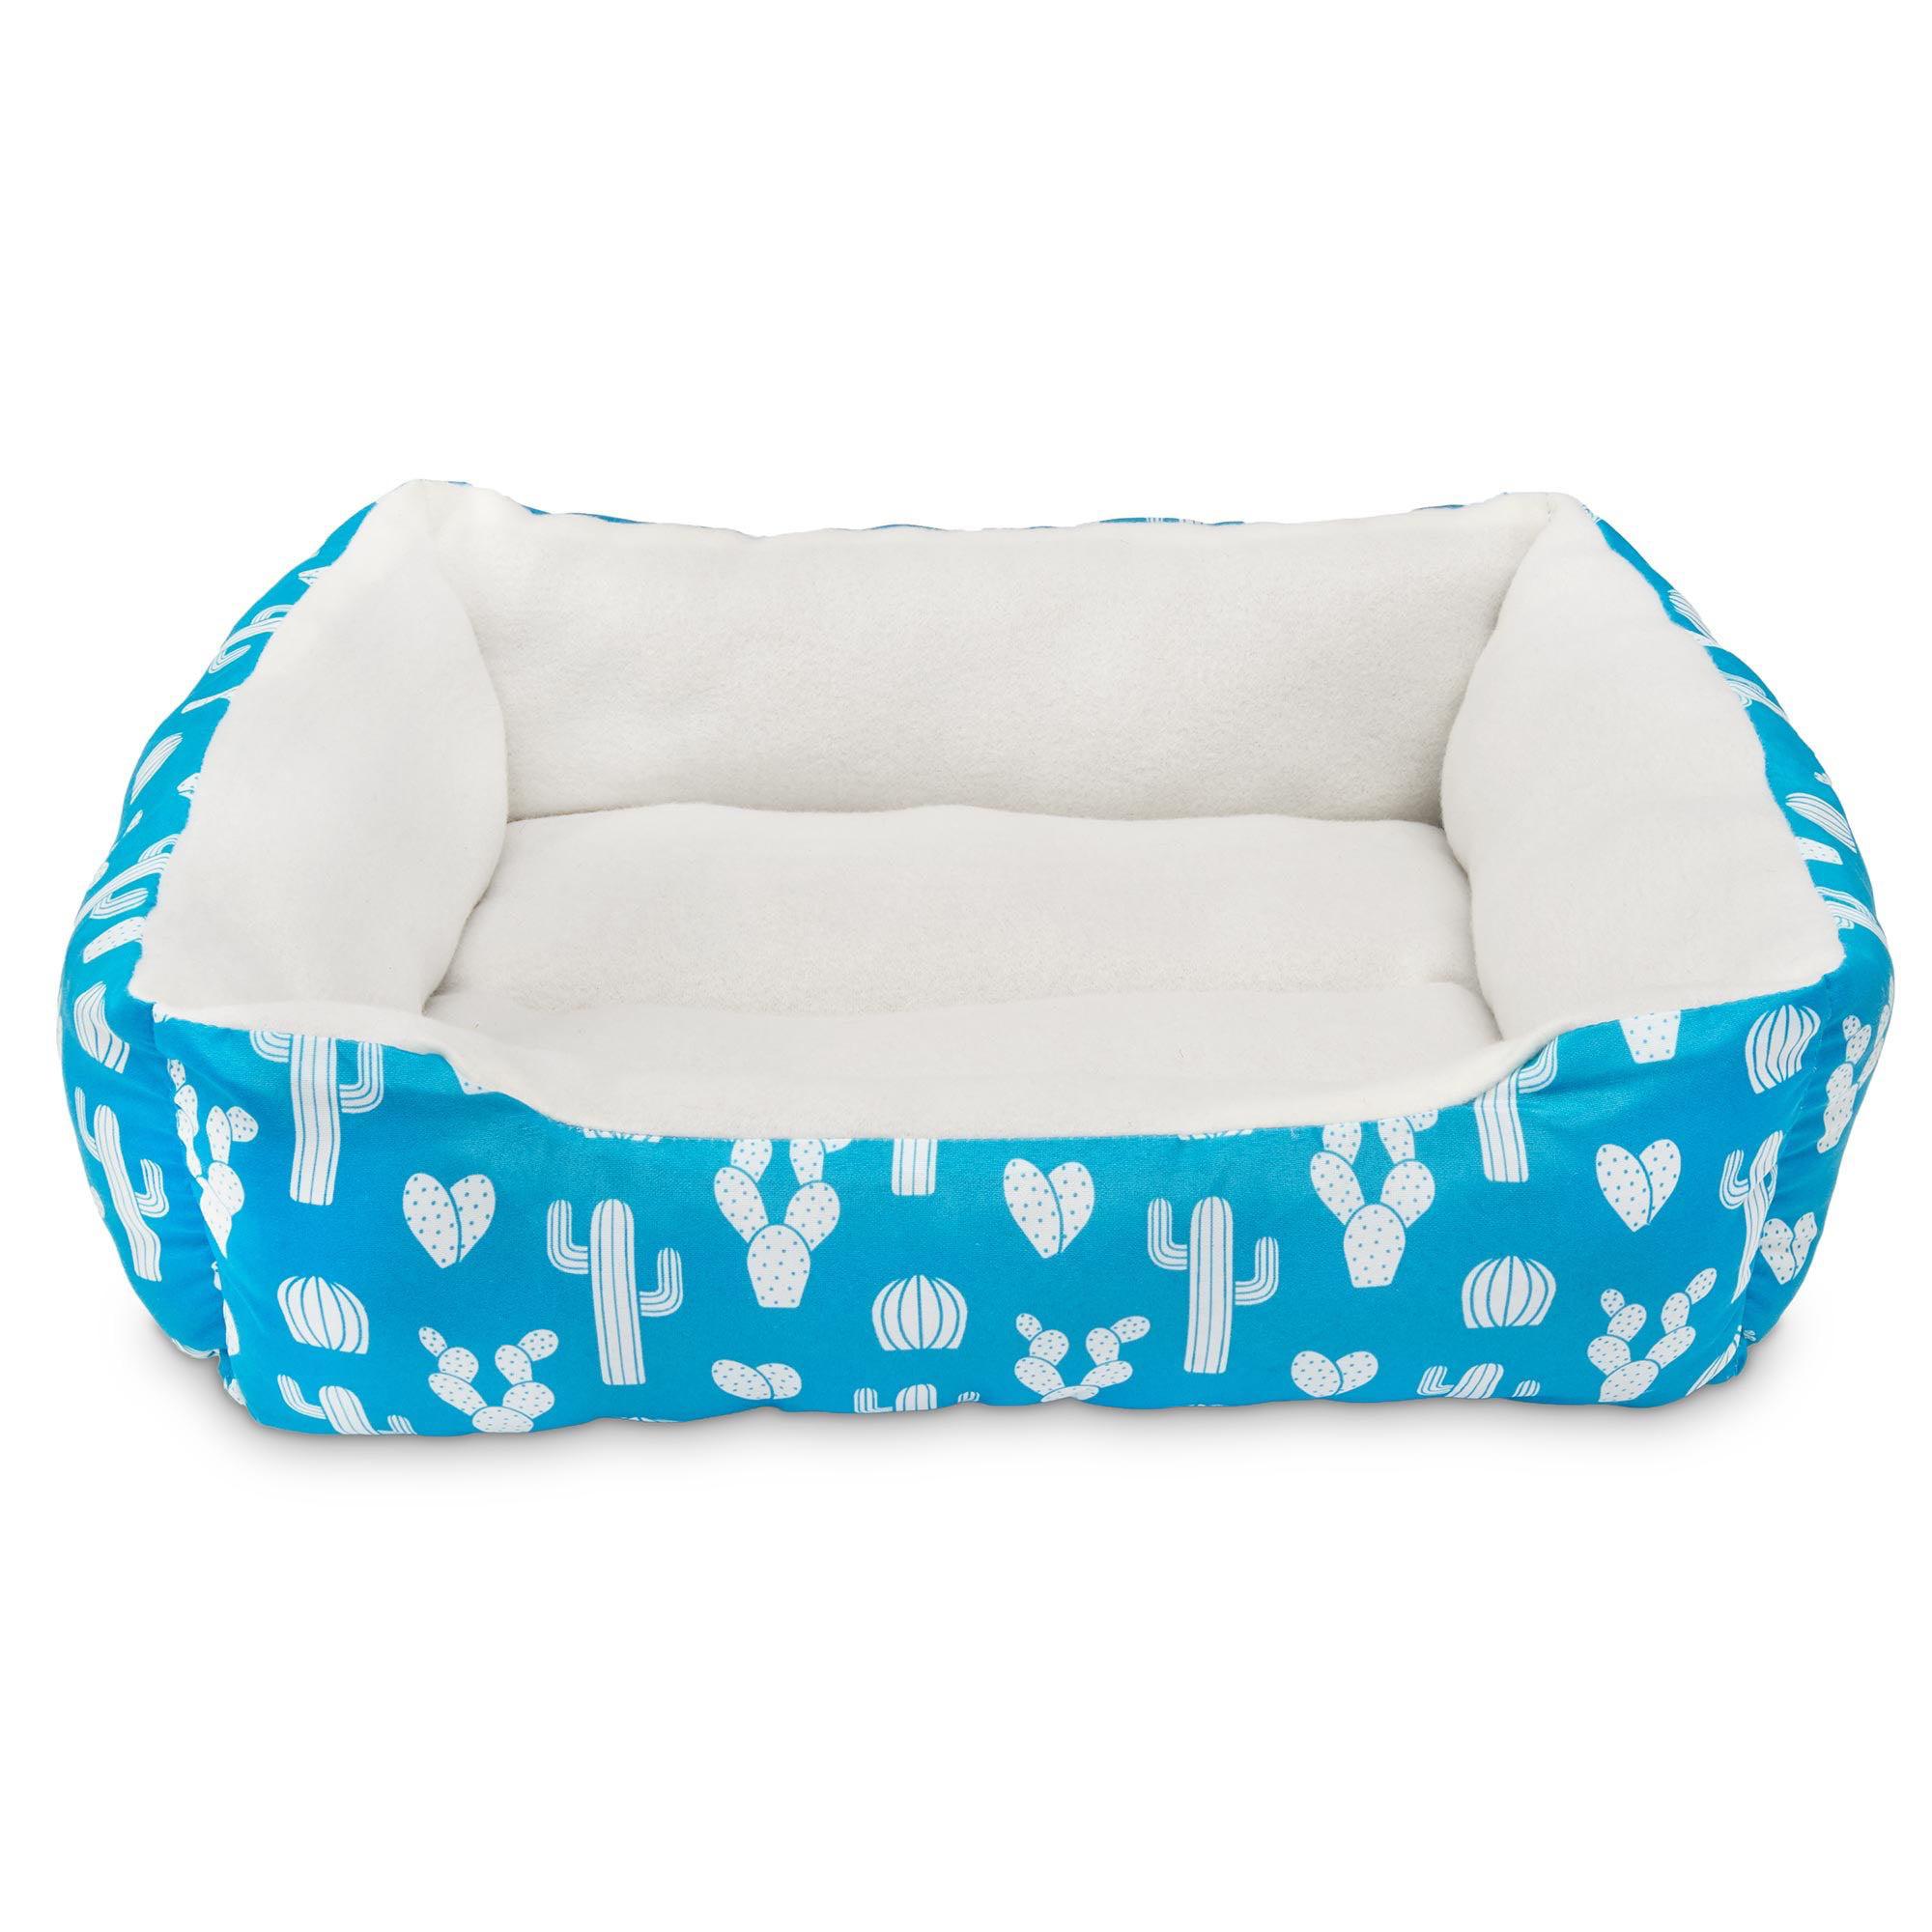 Vibrant Life 19 Small Cuddler Dog Bed